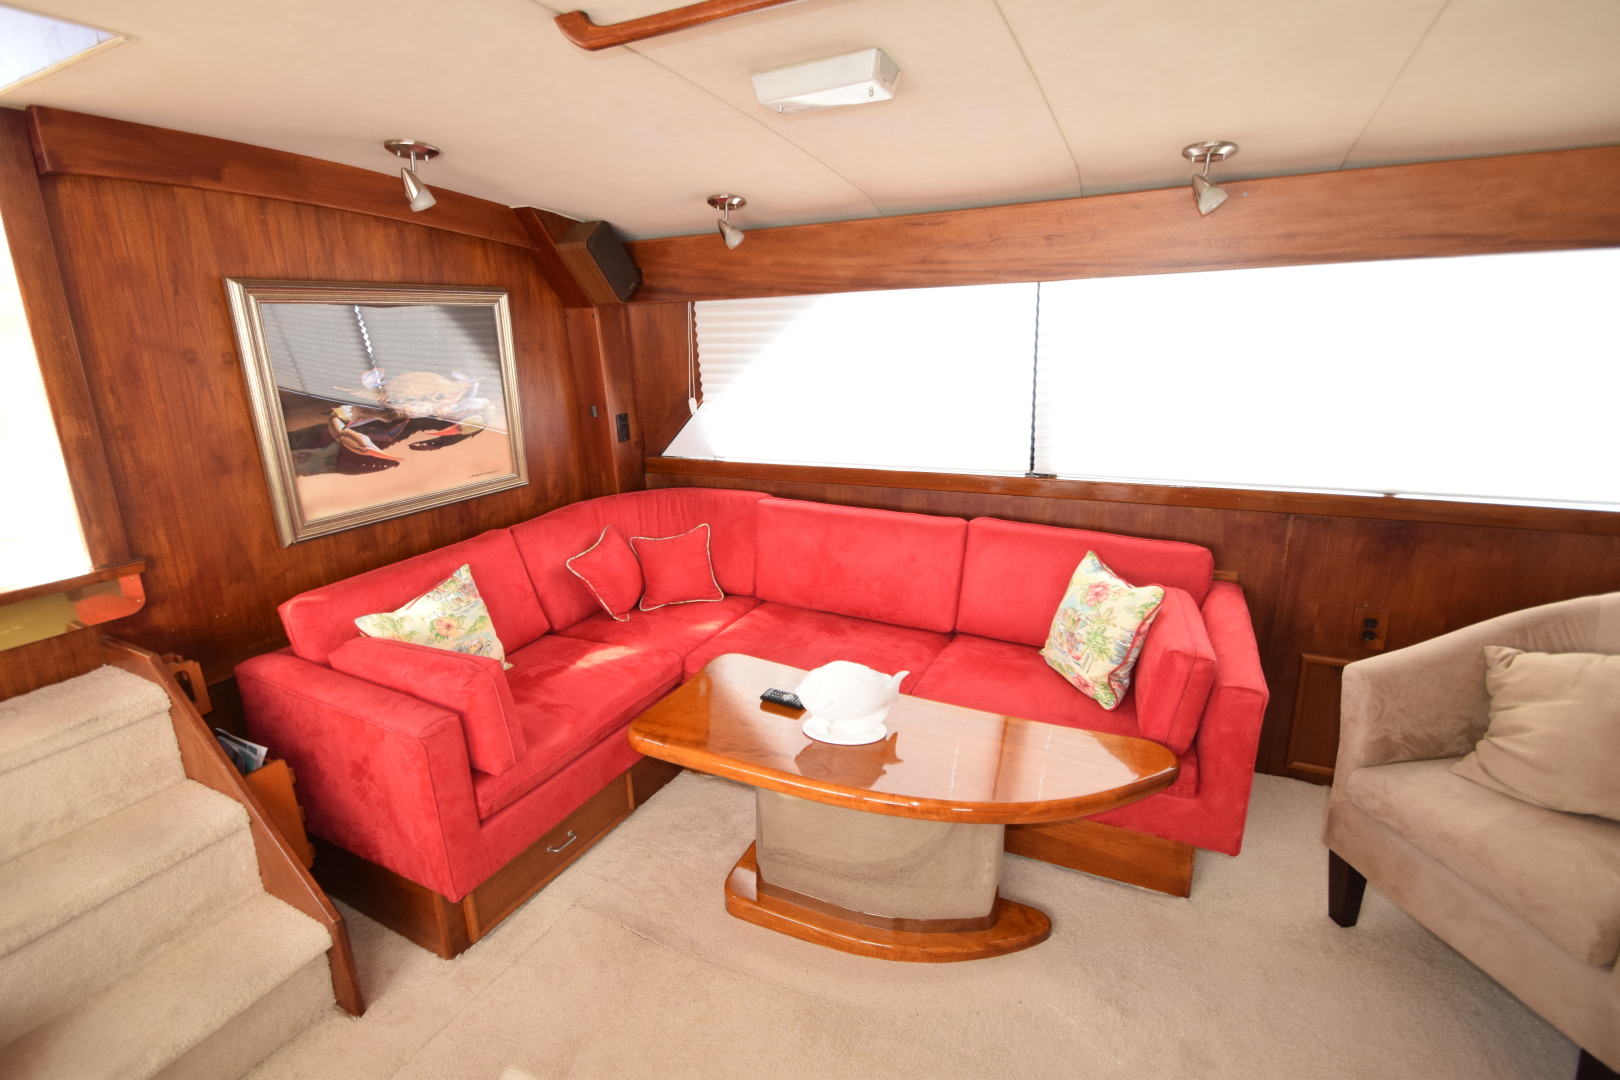 Ocean Yachts-46 Sunliner 1986-Sugah Portsmouth-Virginia-United States-1555523 | Thumbnail